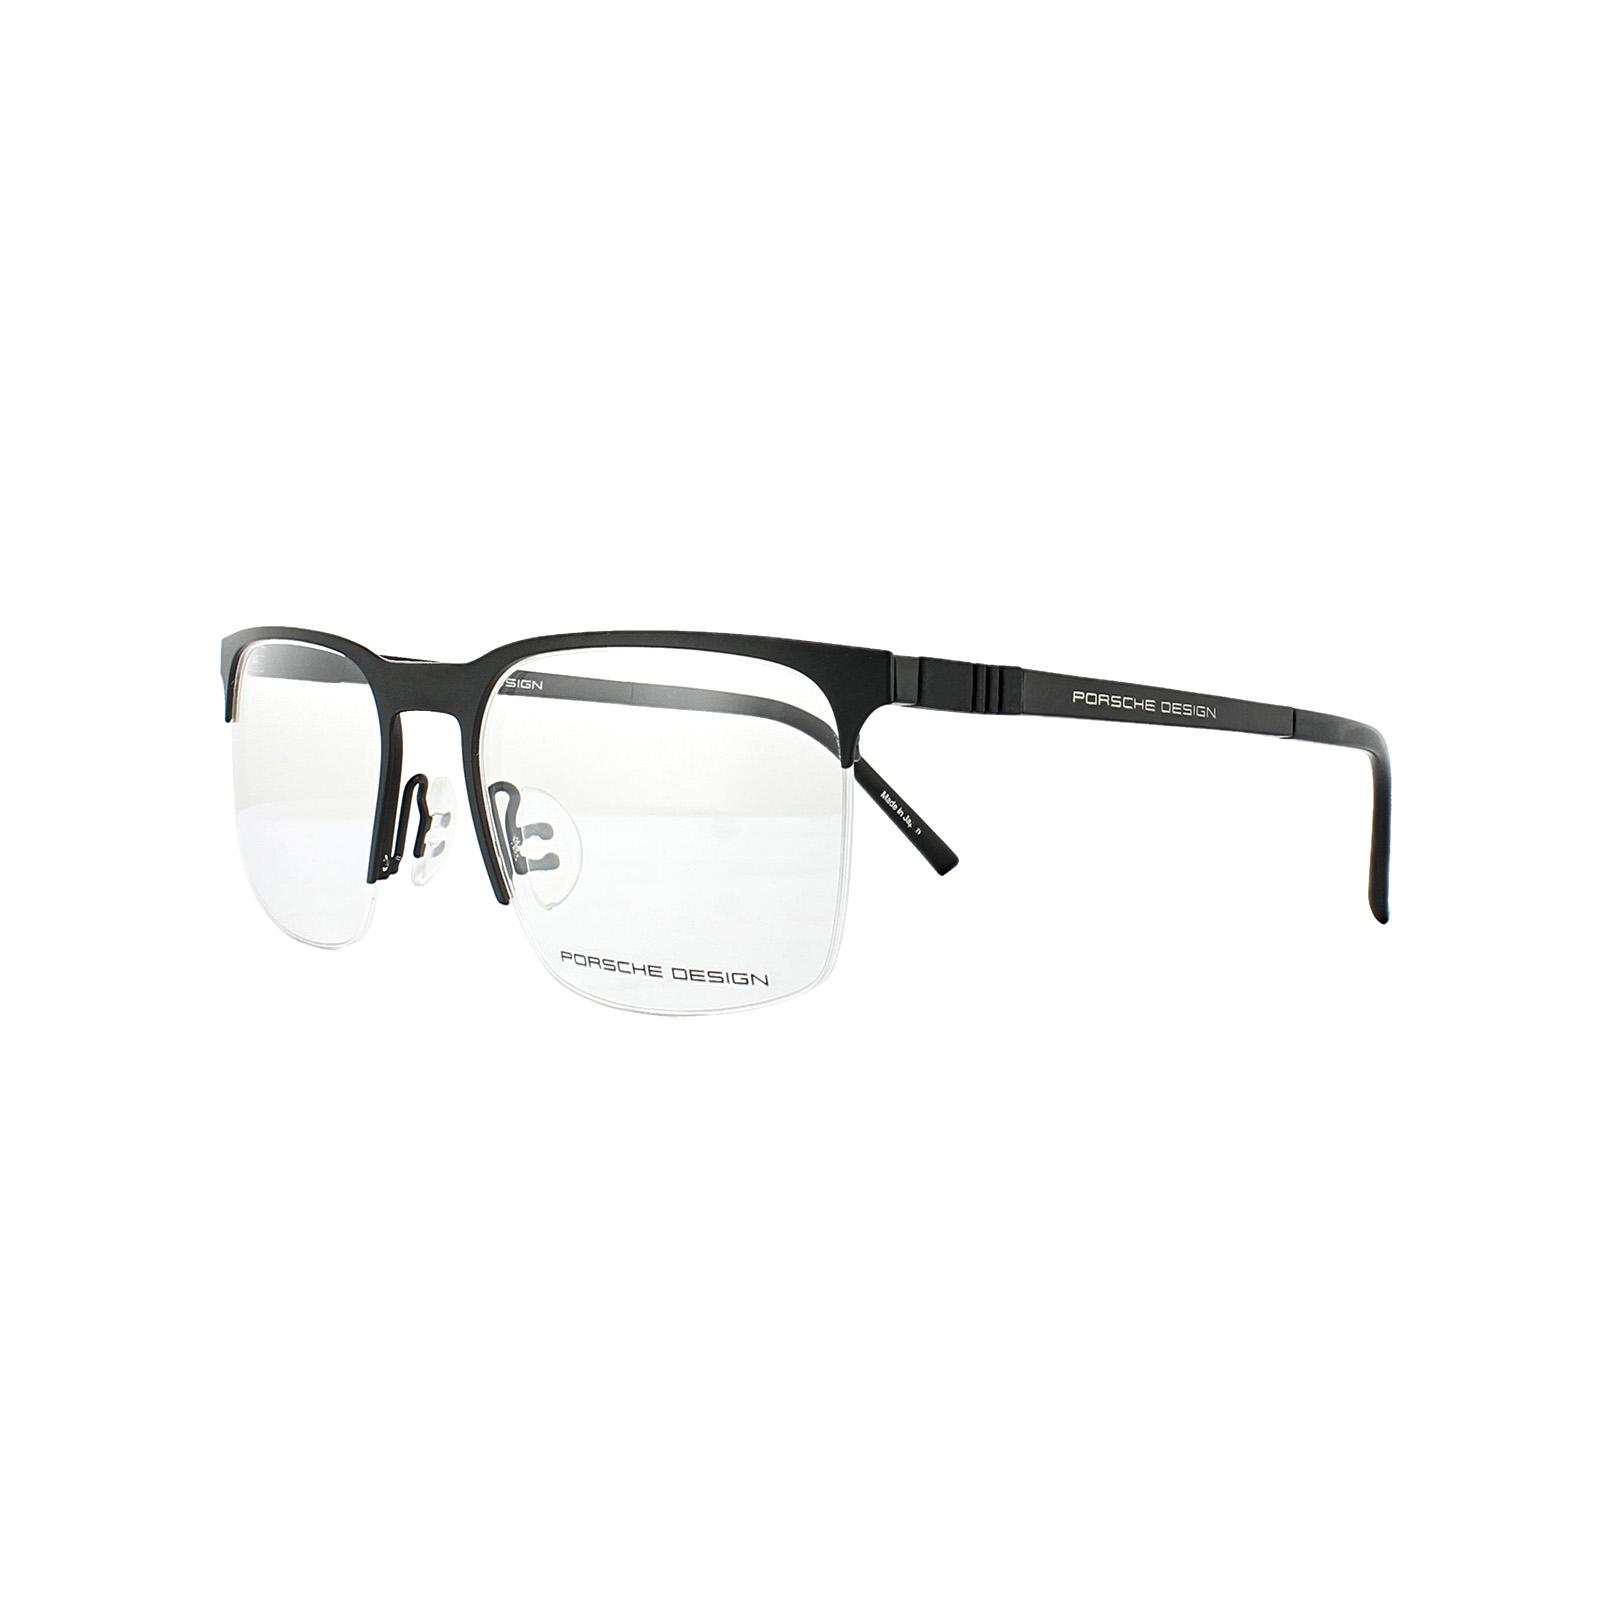 242c857a47e Porsche Design P8277 Glasses Frames Ed Sunglasses